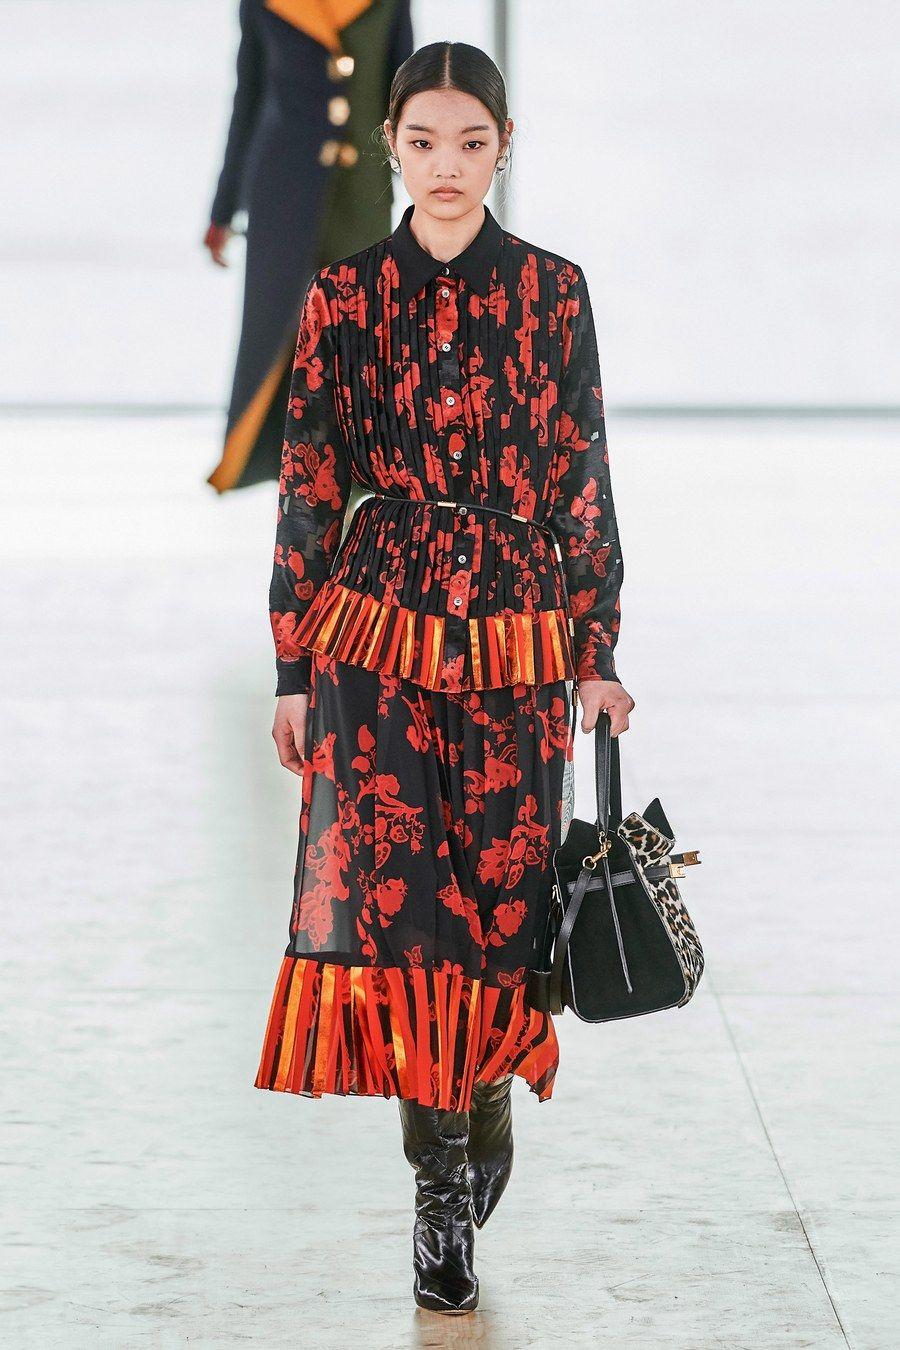 Tory Burch Fall 2019 Ready-to-Wear Fashion Show To